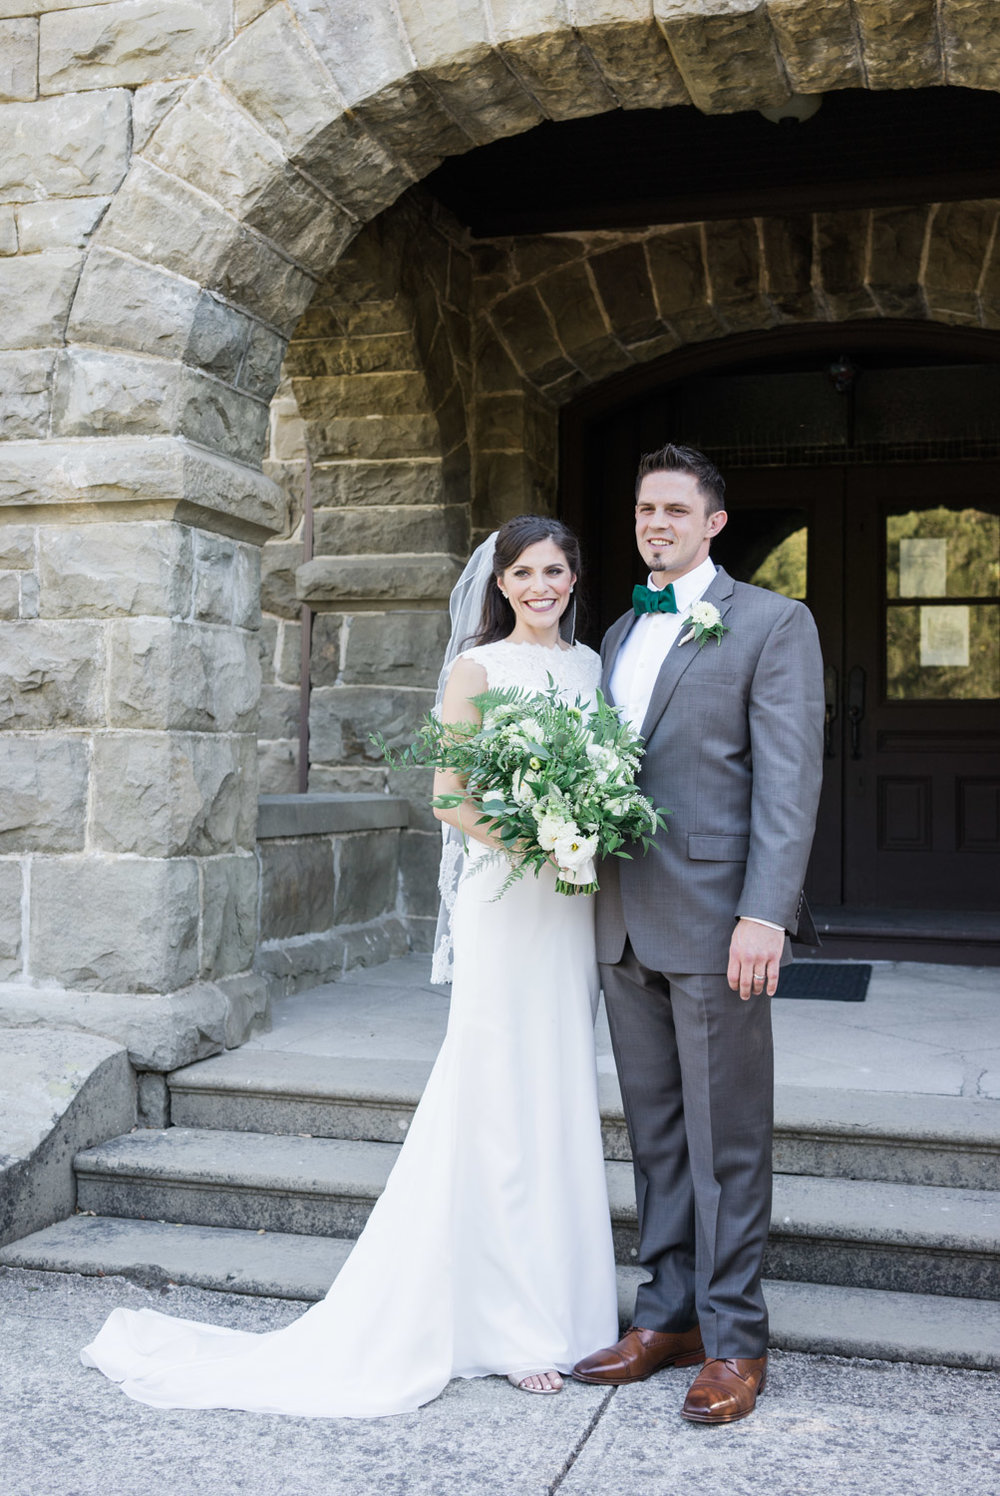 Wedding-couple-outside-elliston-vineyard-wedding-photographer-afewgoodclicks.net